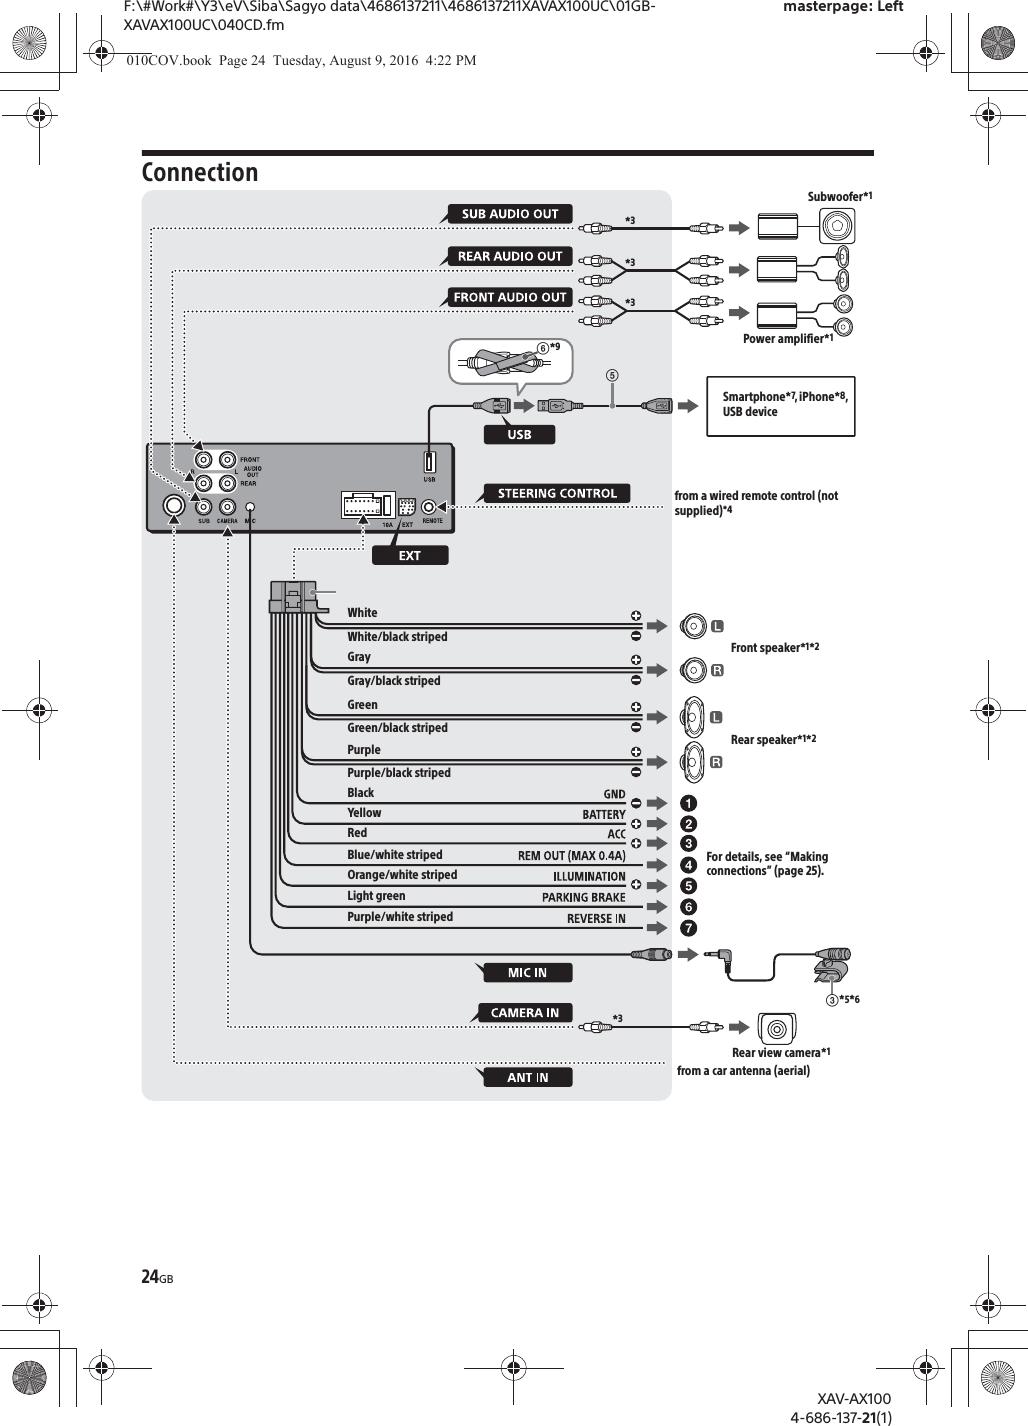 Car Audio Wiring Diagram Sony Xav 60 - 1993 Chevrolet Wiring Diagram Free  Picture Schematic - corollaa.yenpancane.jeanjaures37.fr | Car Audio Wiring Diagram Sony Xav 60 |  | Wiring Diagram Resource